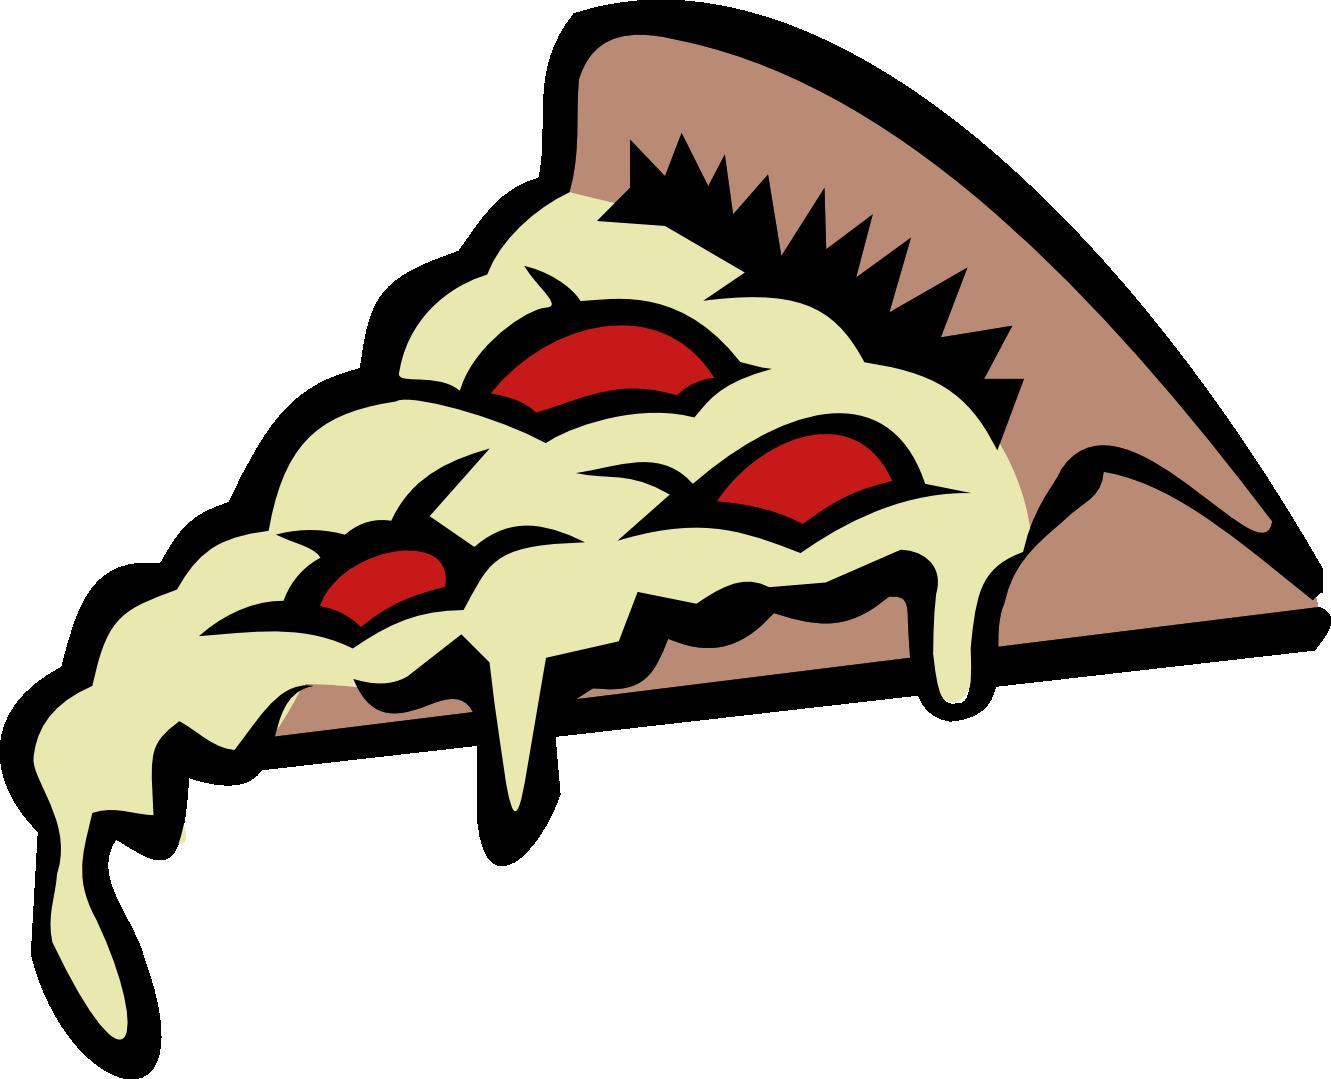 Pizza Slice Clipart Black And White | Clipart Panda - Free Clipart ...